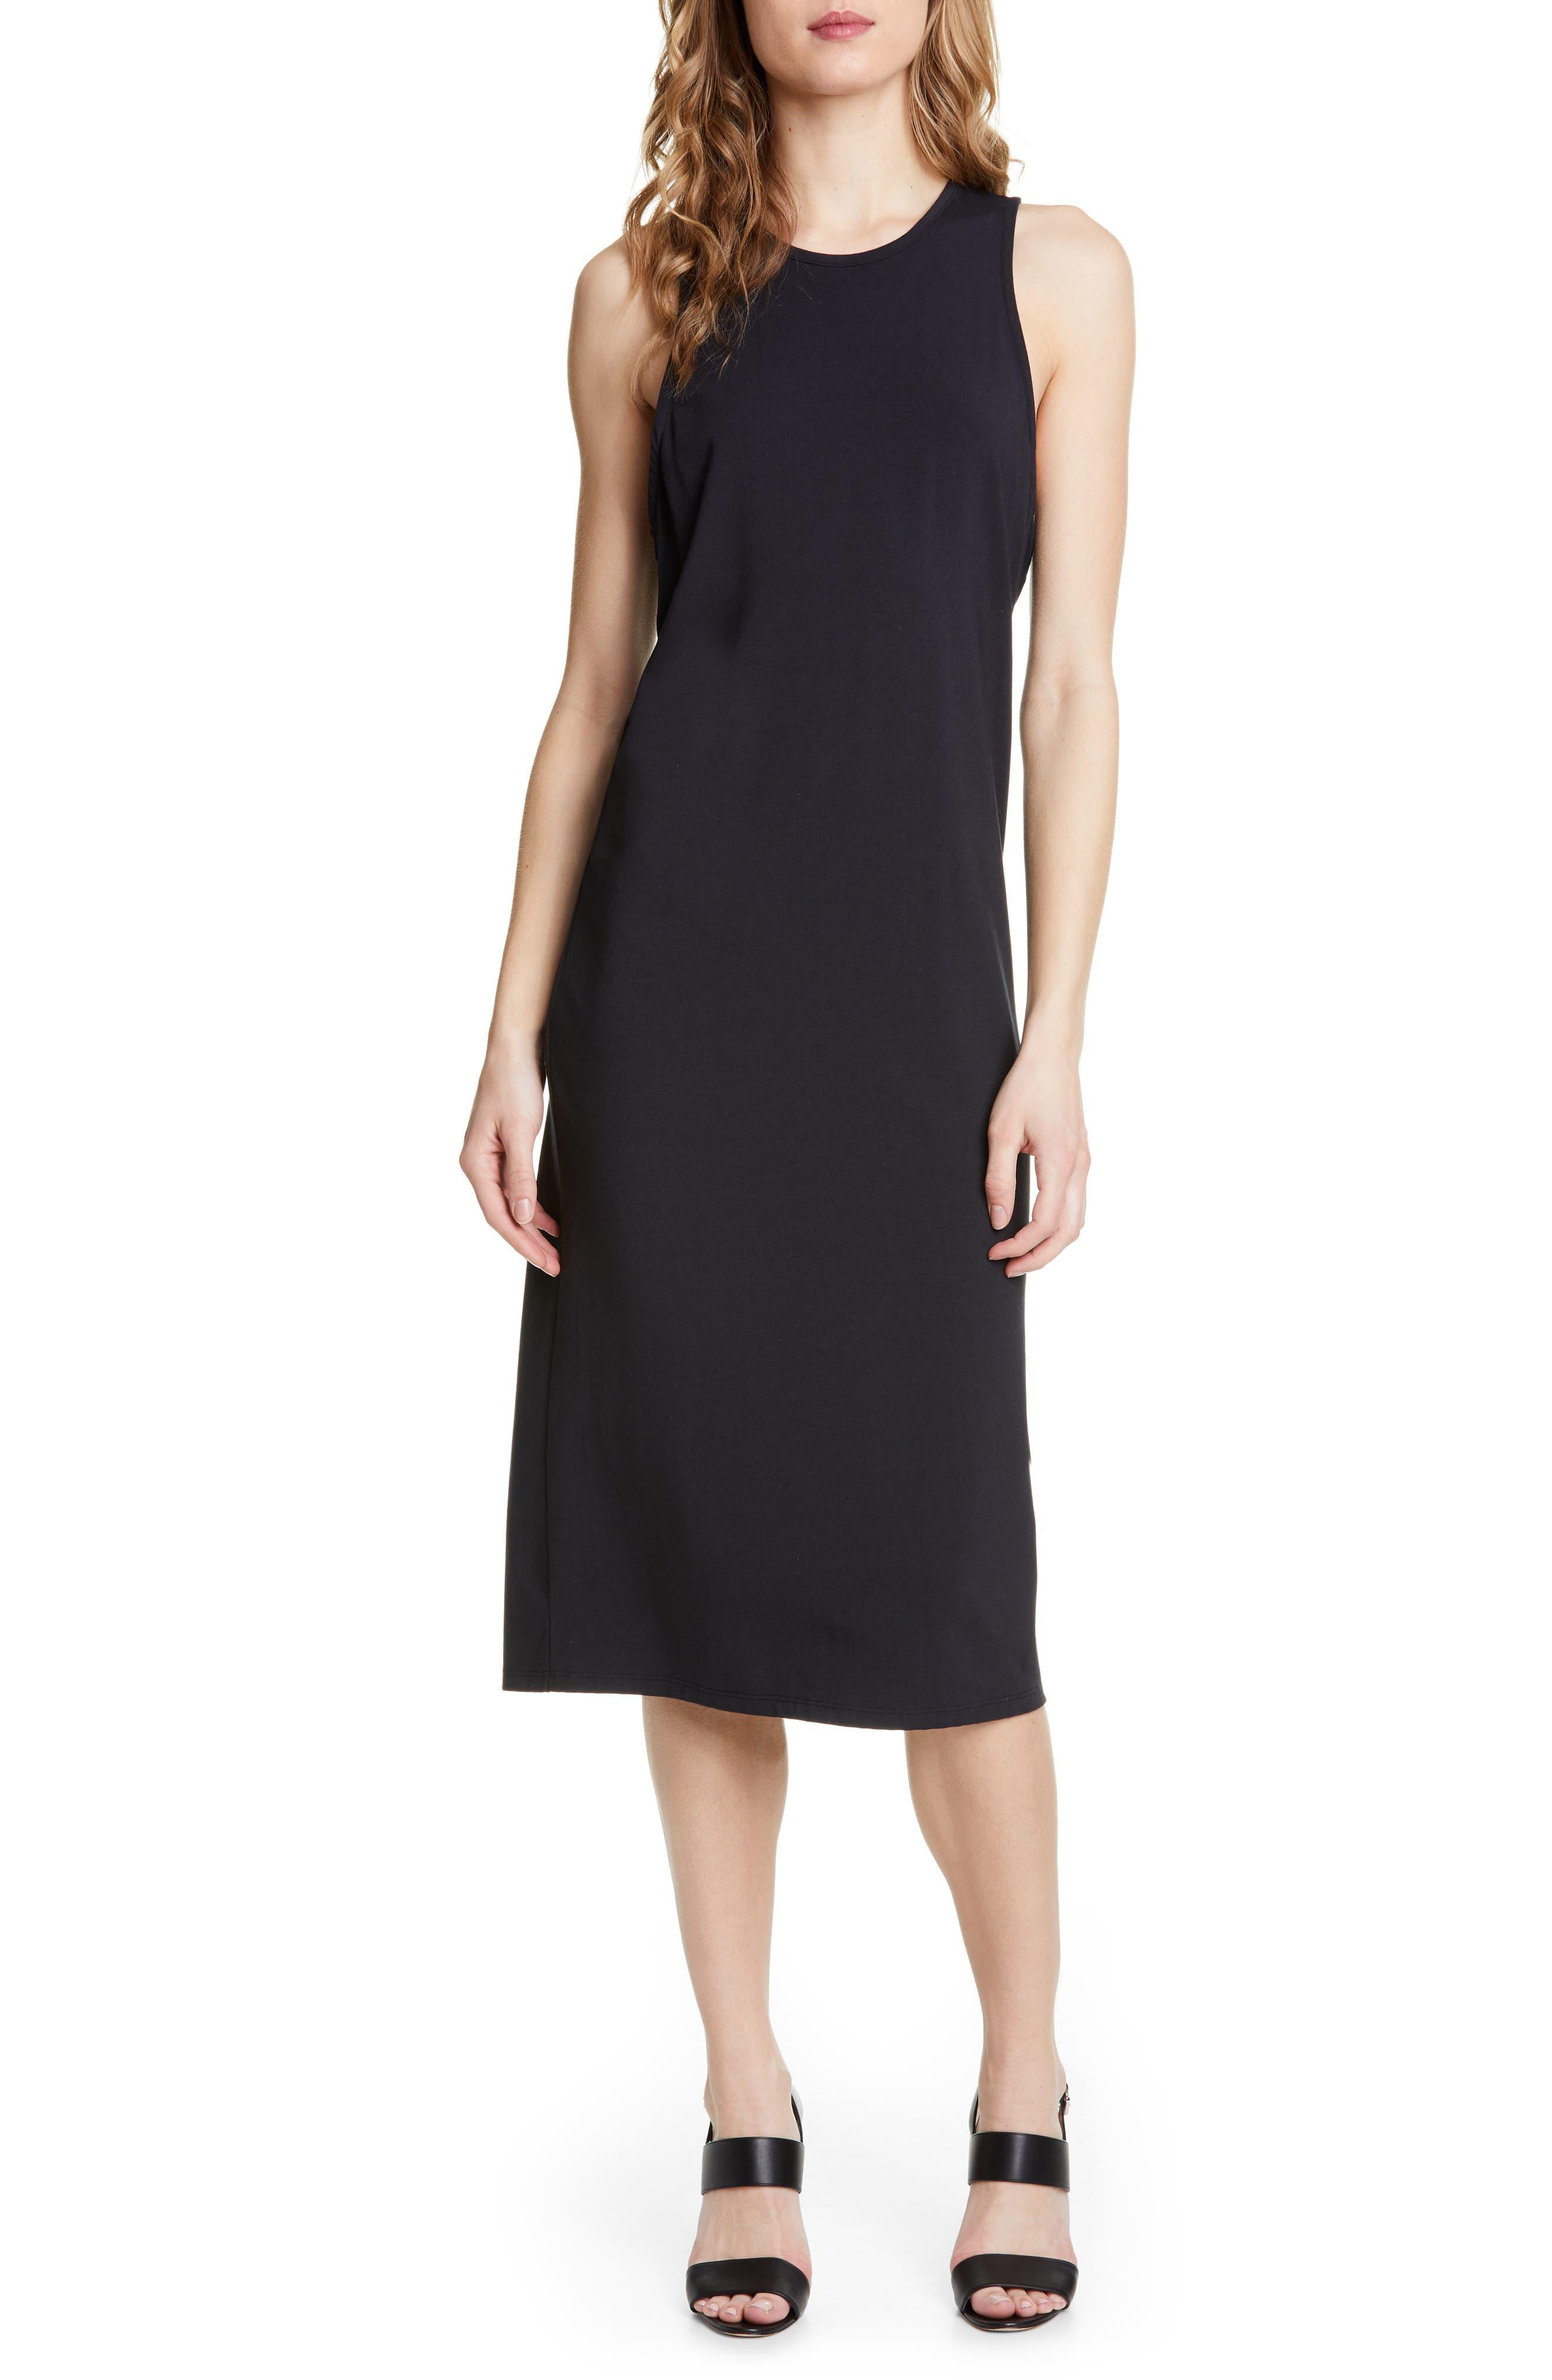 Joie Mikaya Stretch Cotton Blend Tank Dress, Black